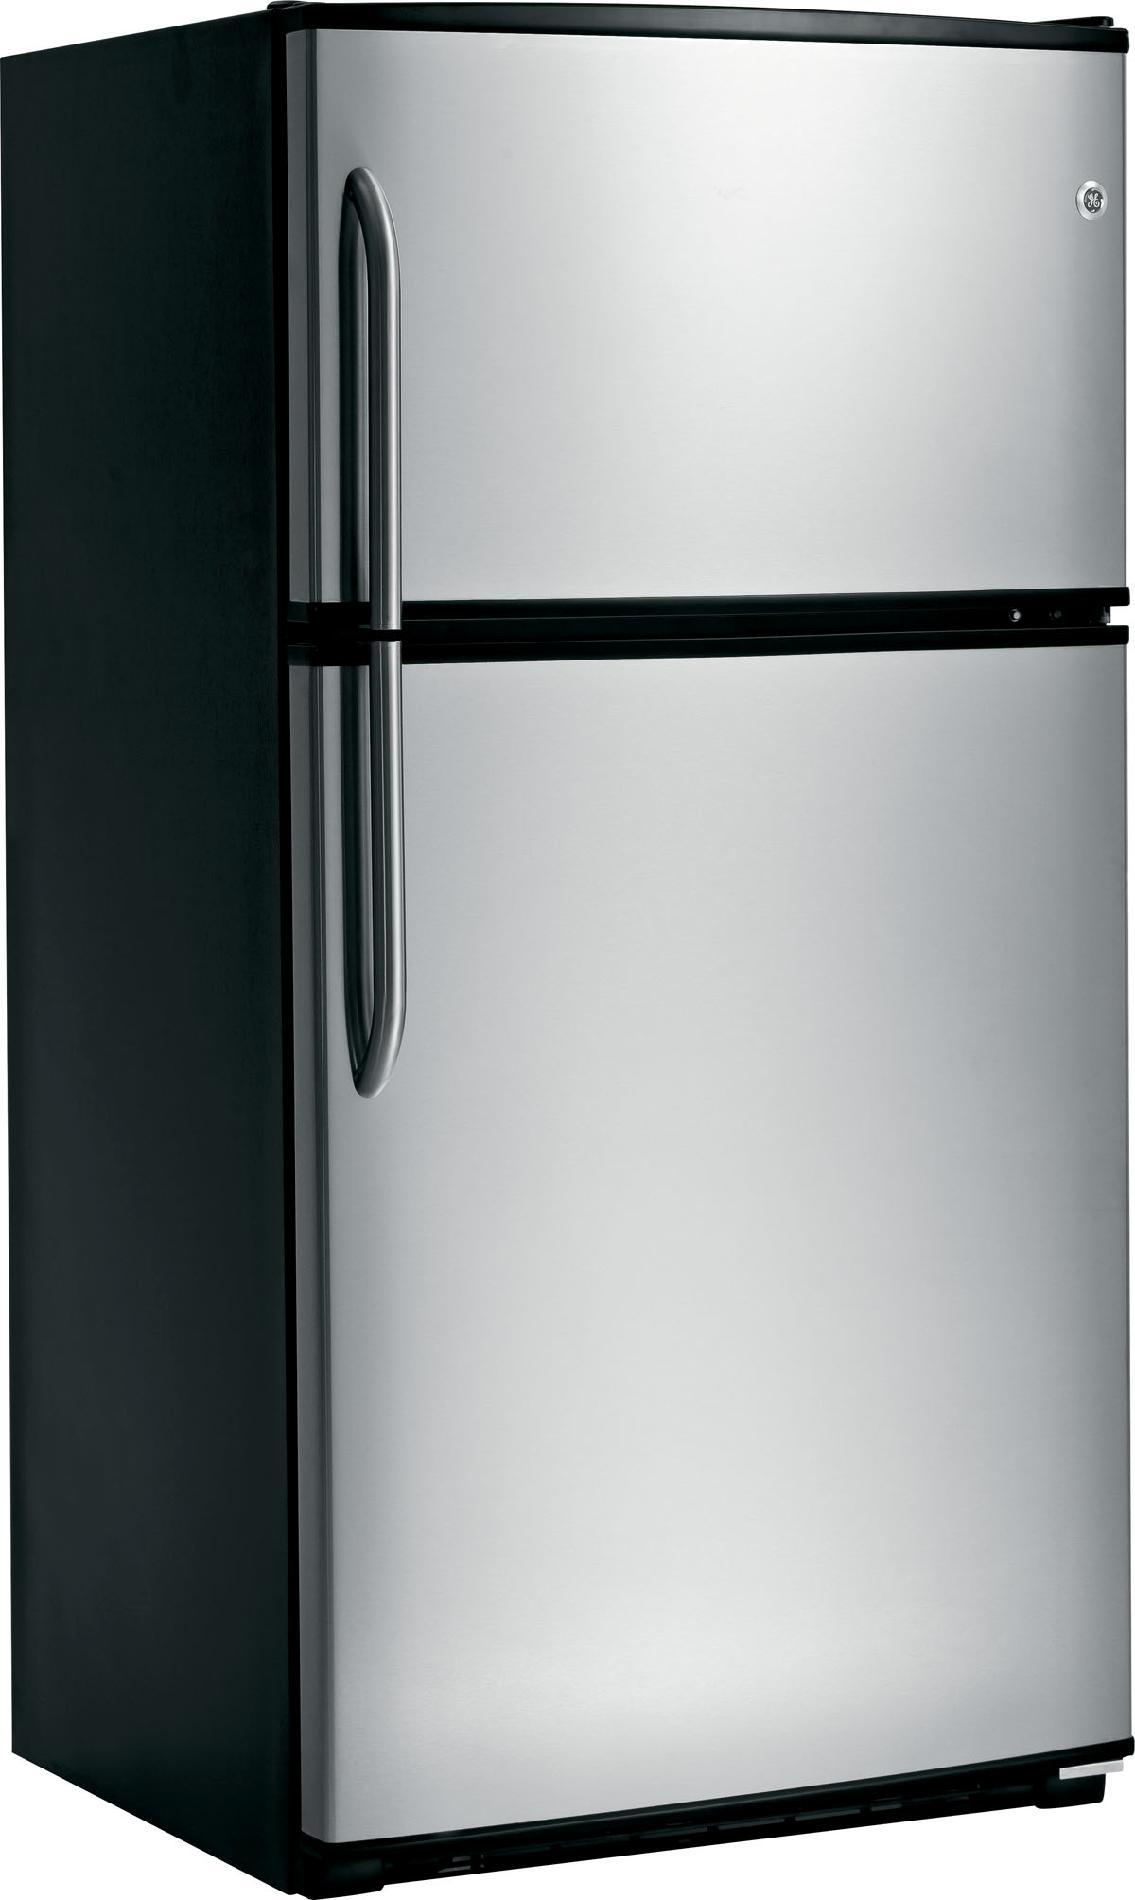 GE 21.0 cu. ft. Top-Freezer Refrigerator - Stainless Steel